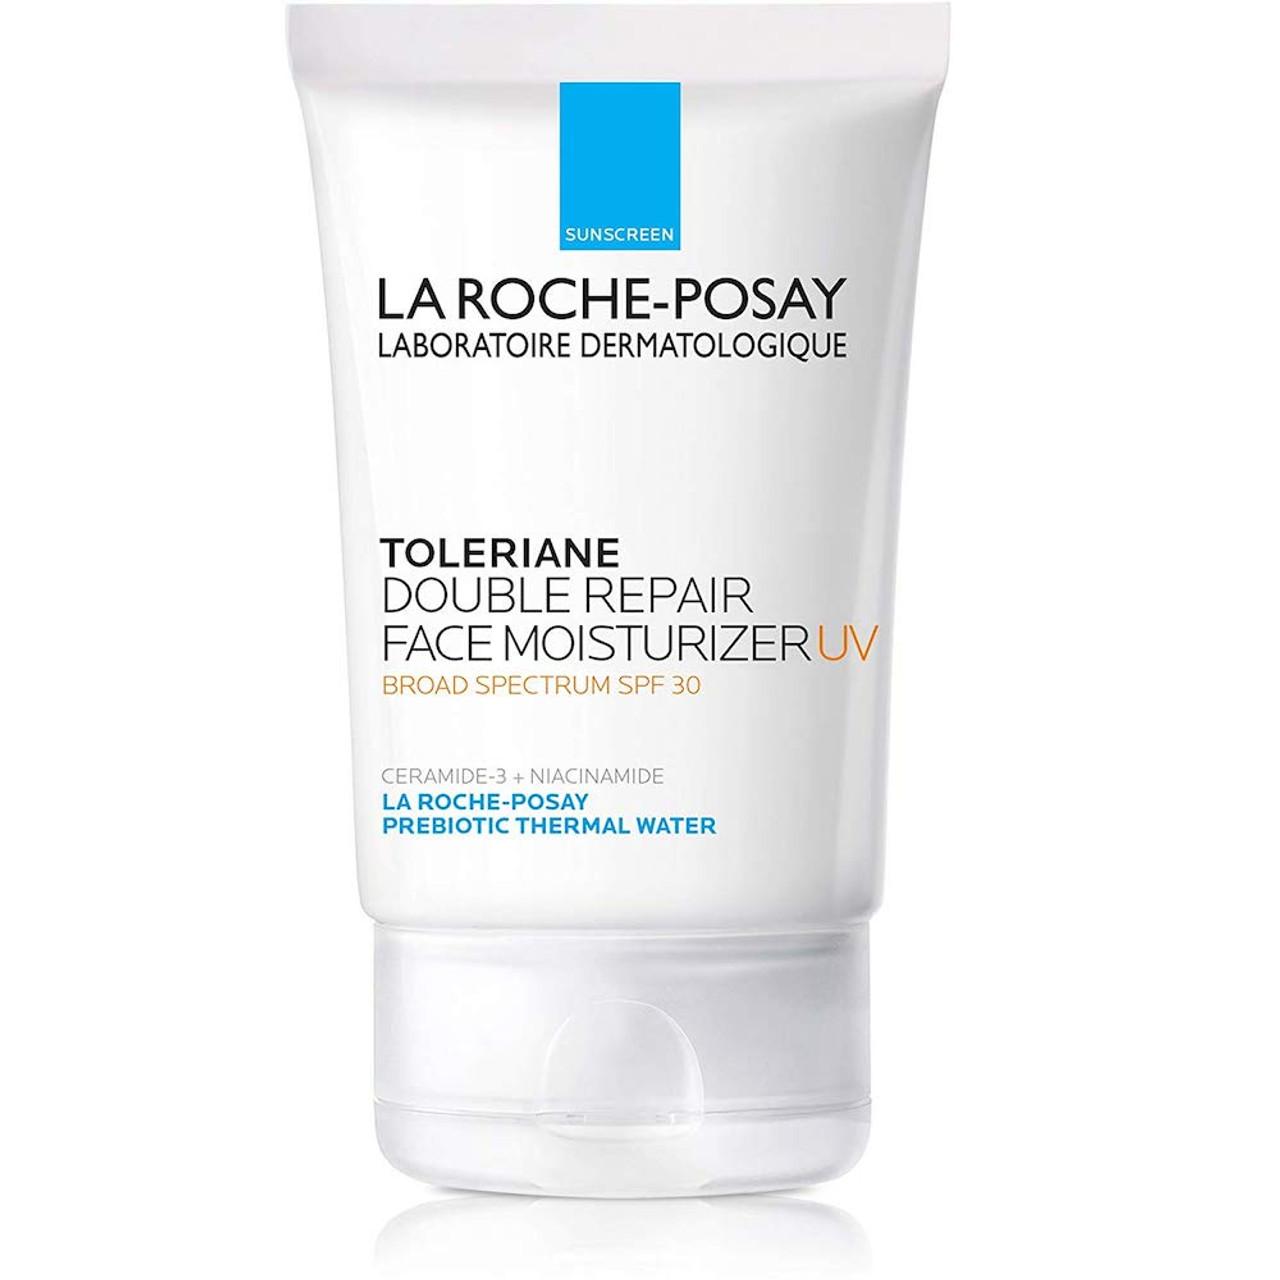 La Roche Posay Toleriane Double Repair Facial Moisturizer UV SPF 30 BeautifiedYou.com